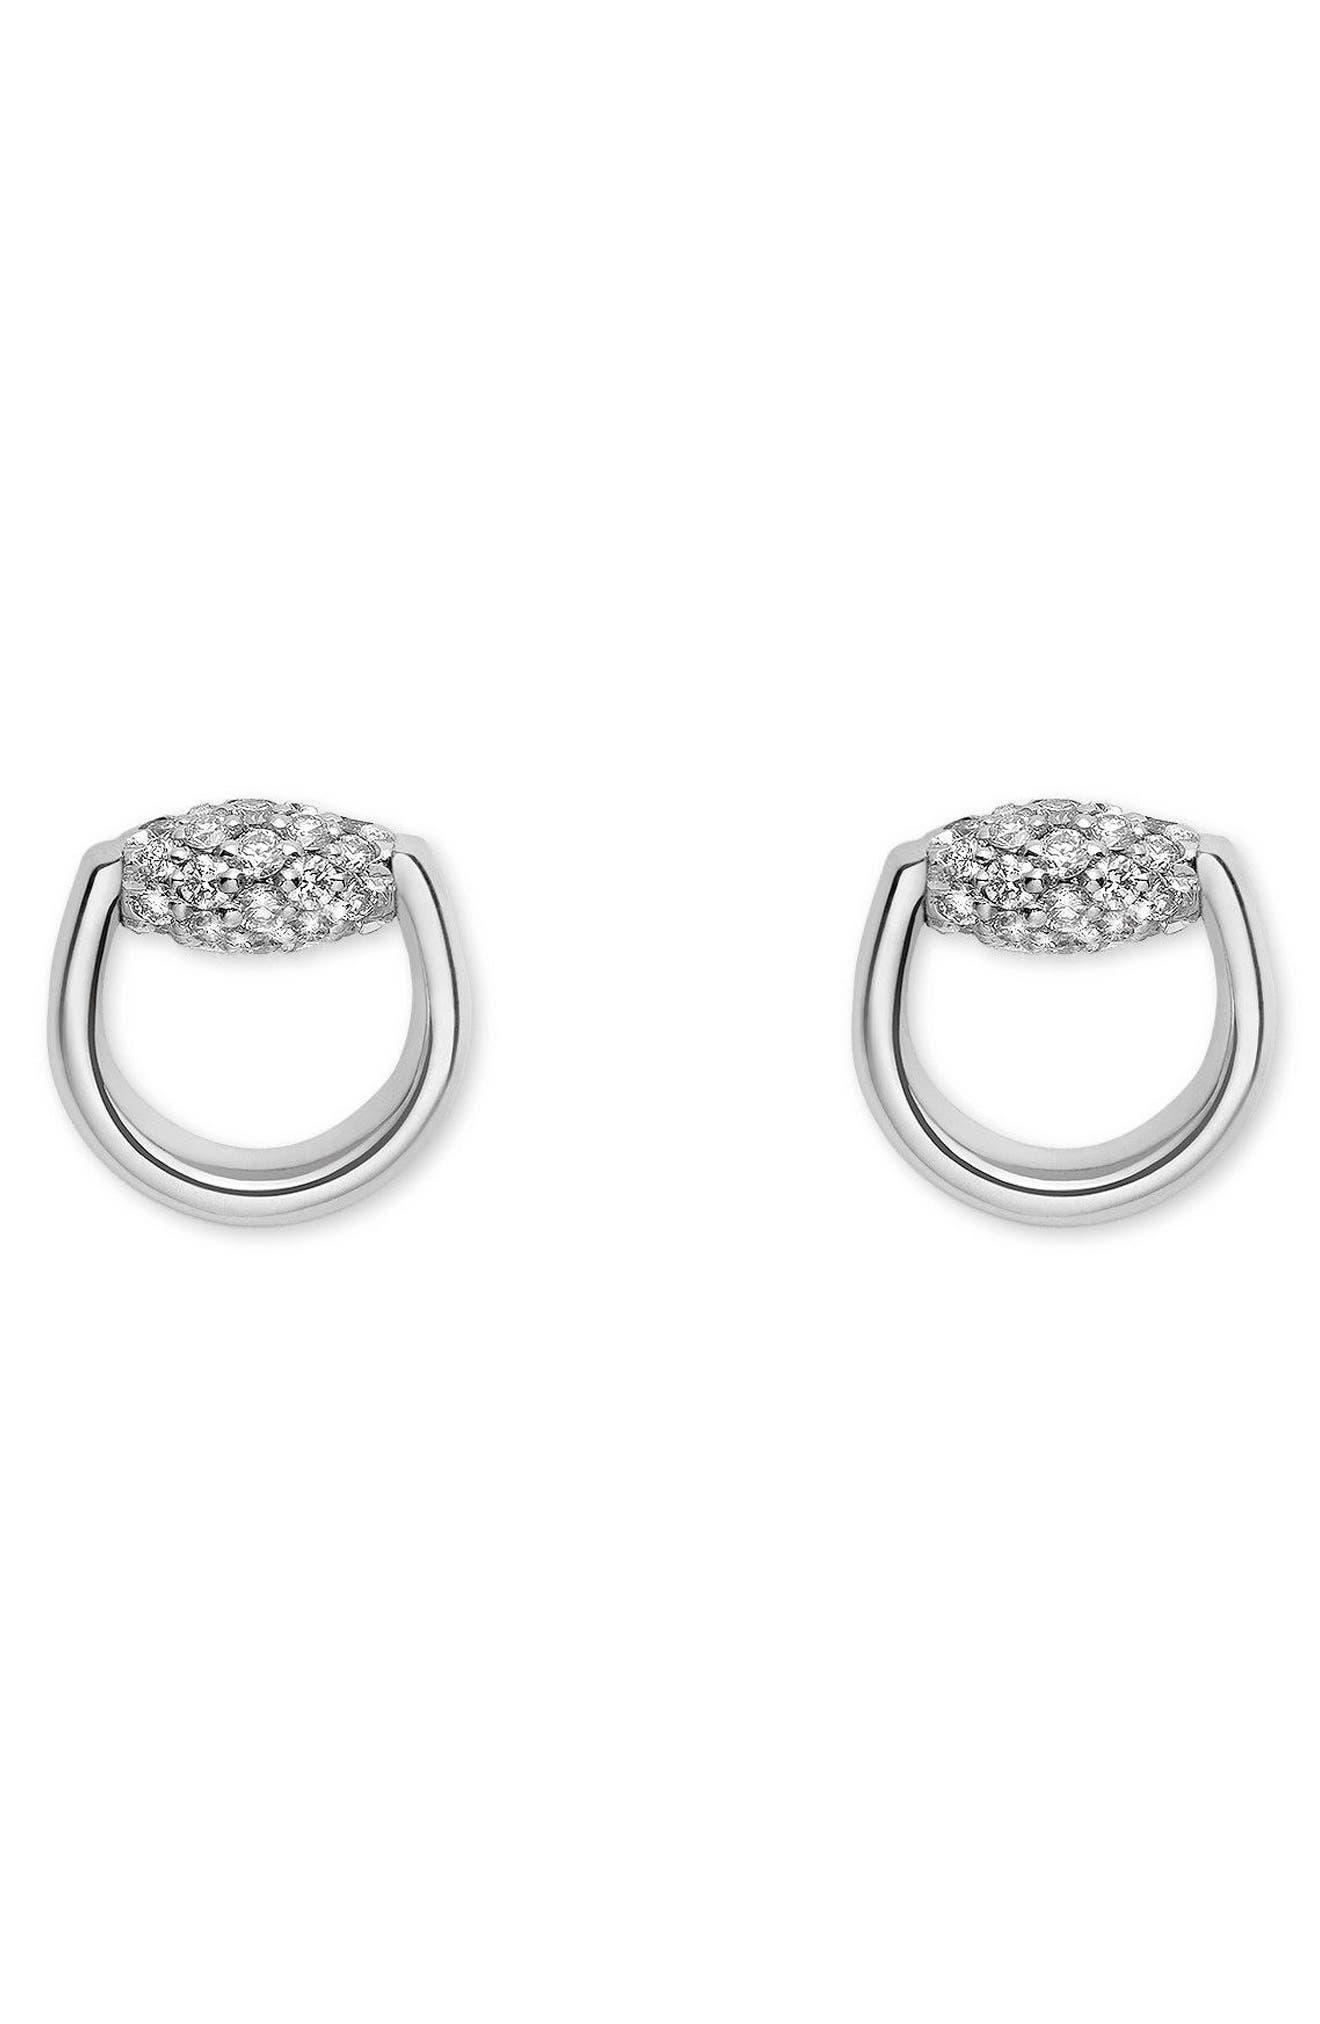 Horsebit Diamond Stud Earrings,                             Main thumbnail 1, color,                             711